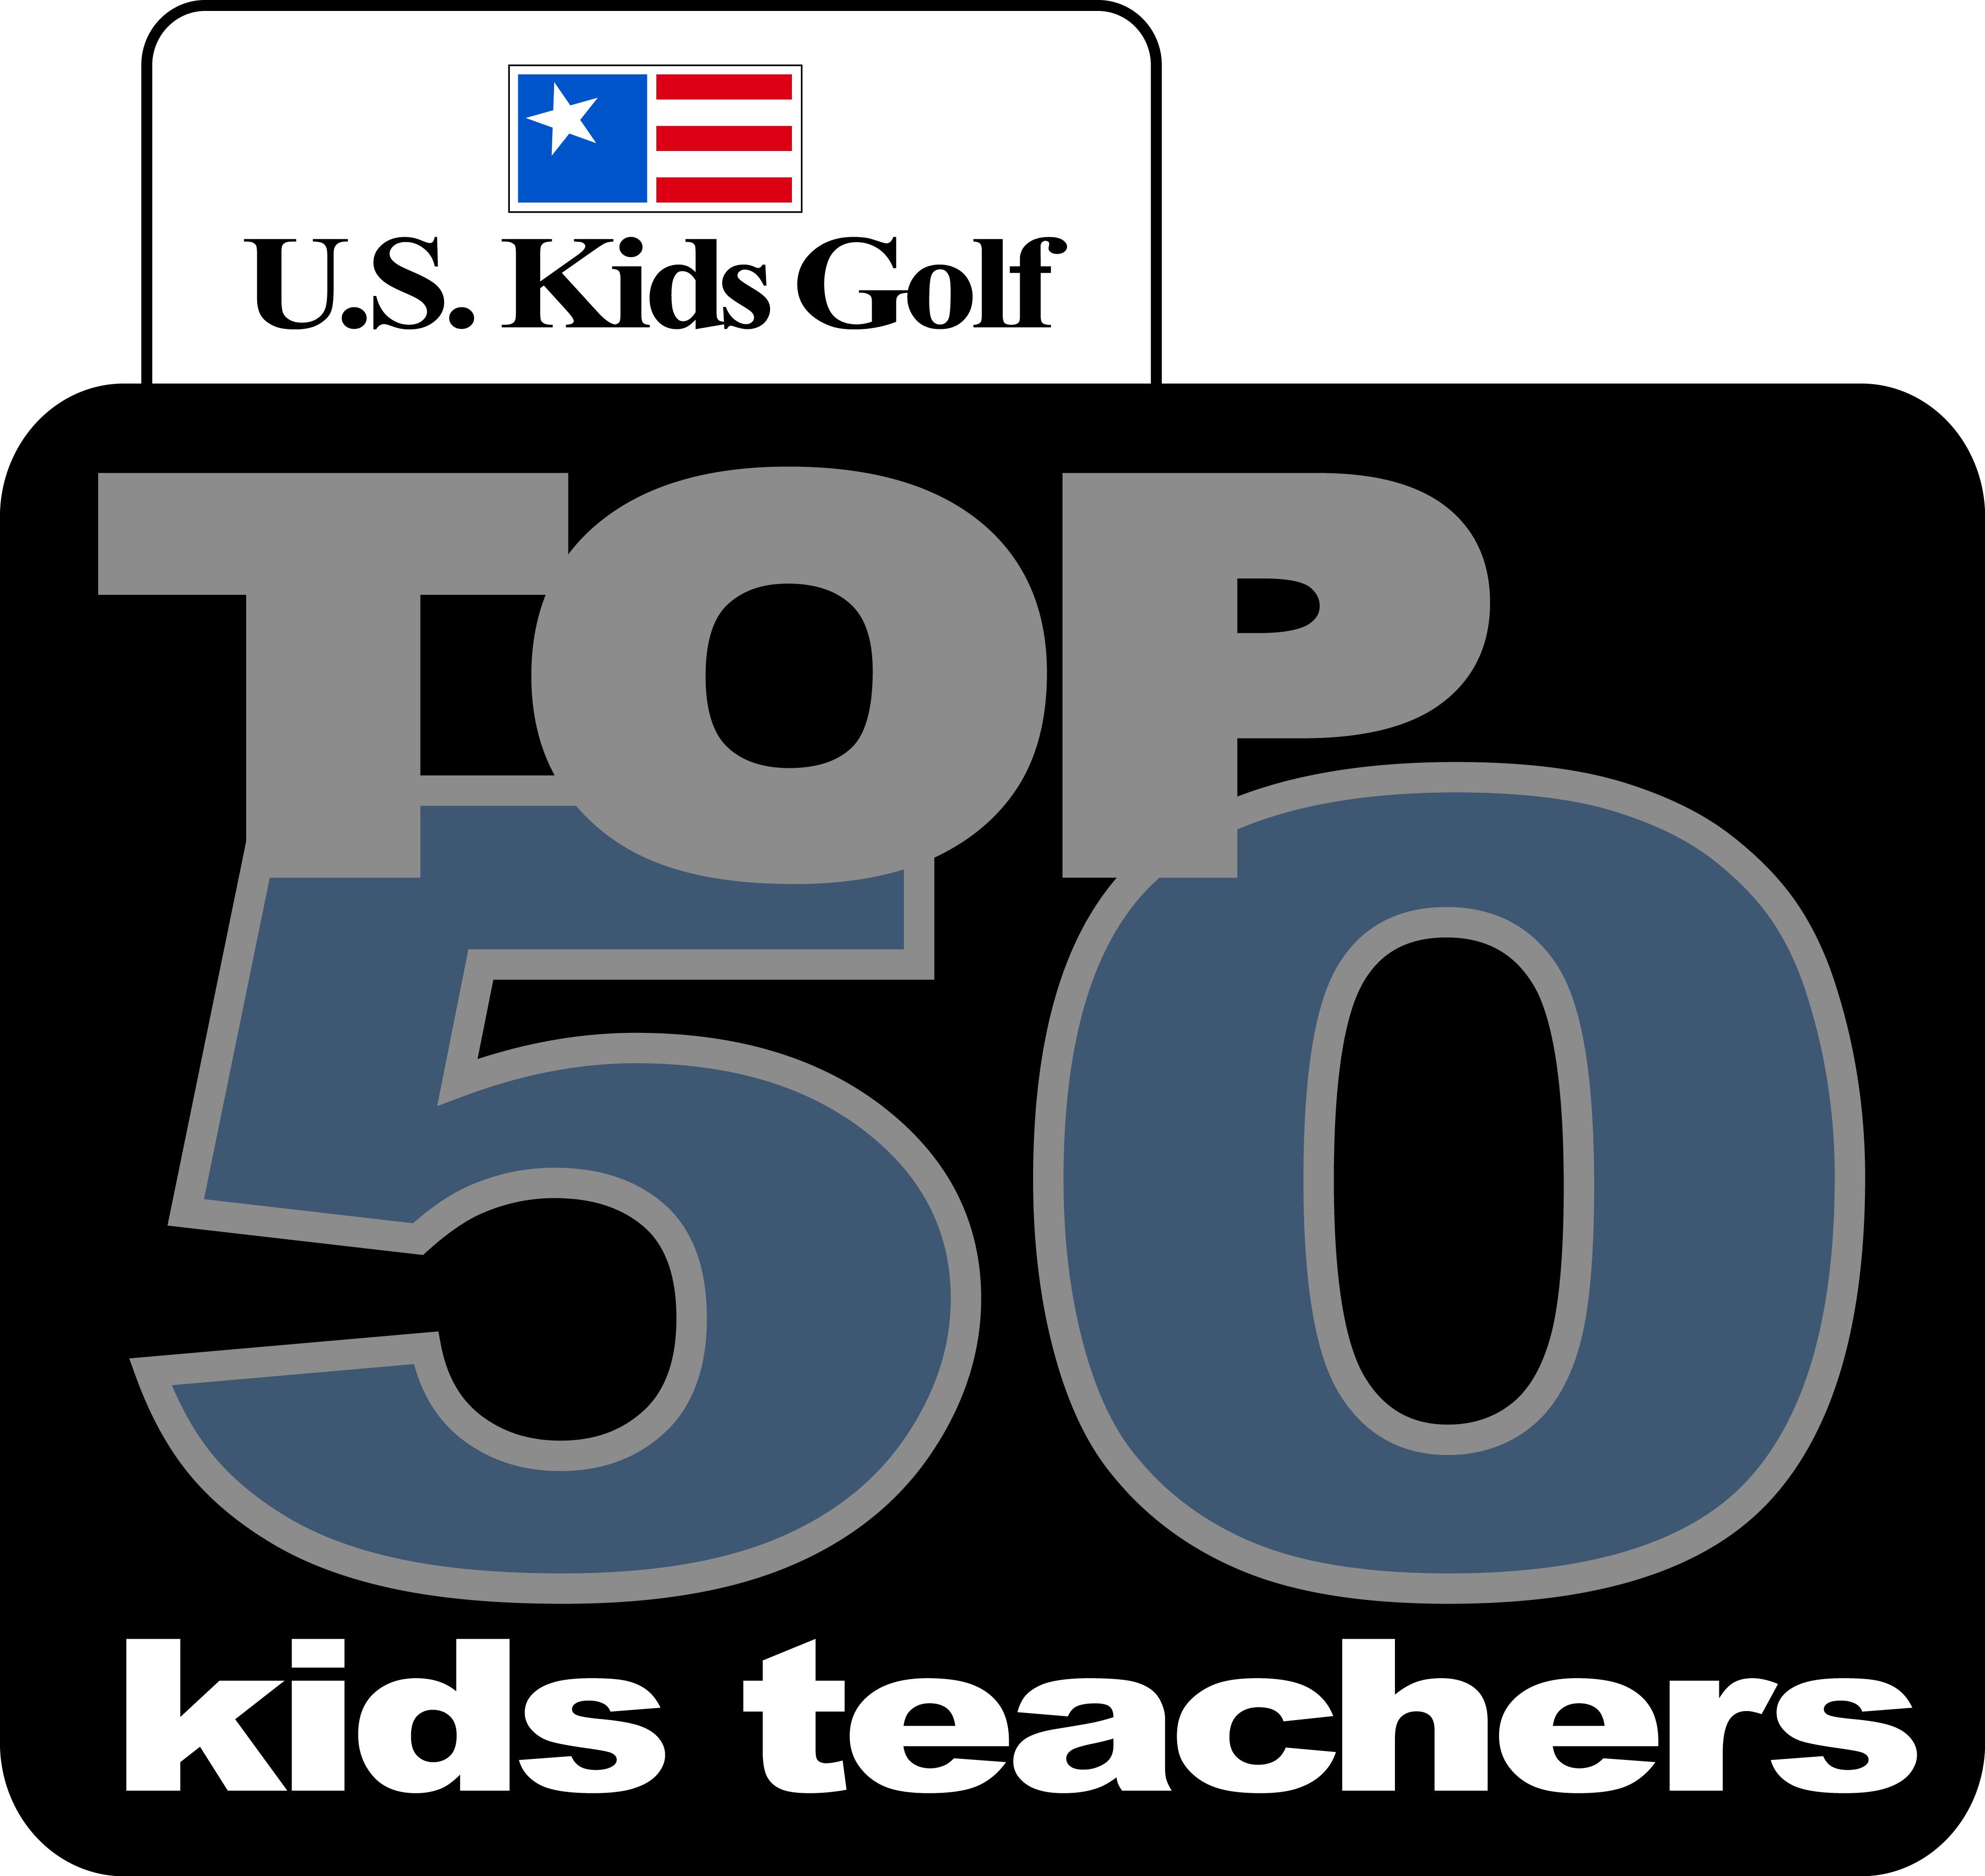 USKG Top 50